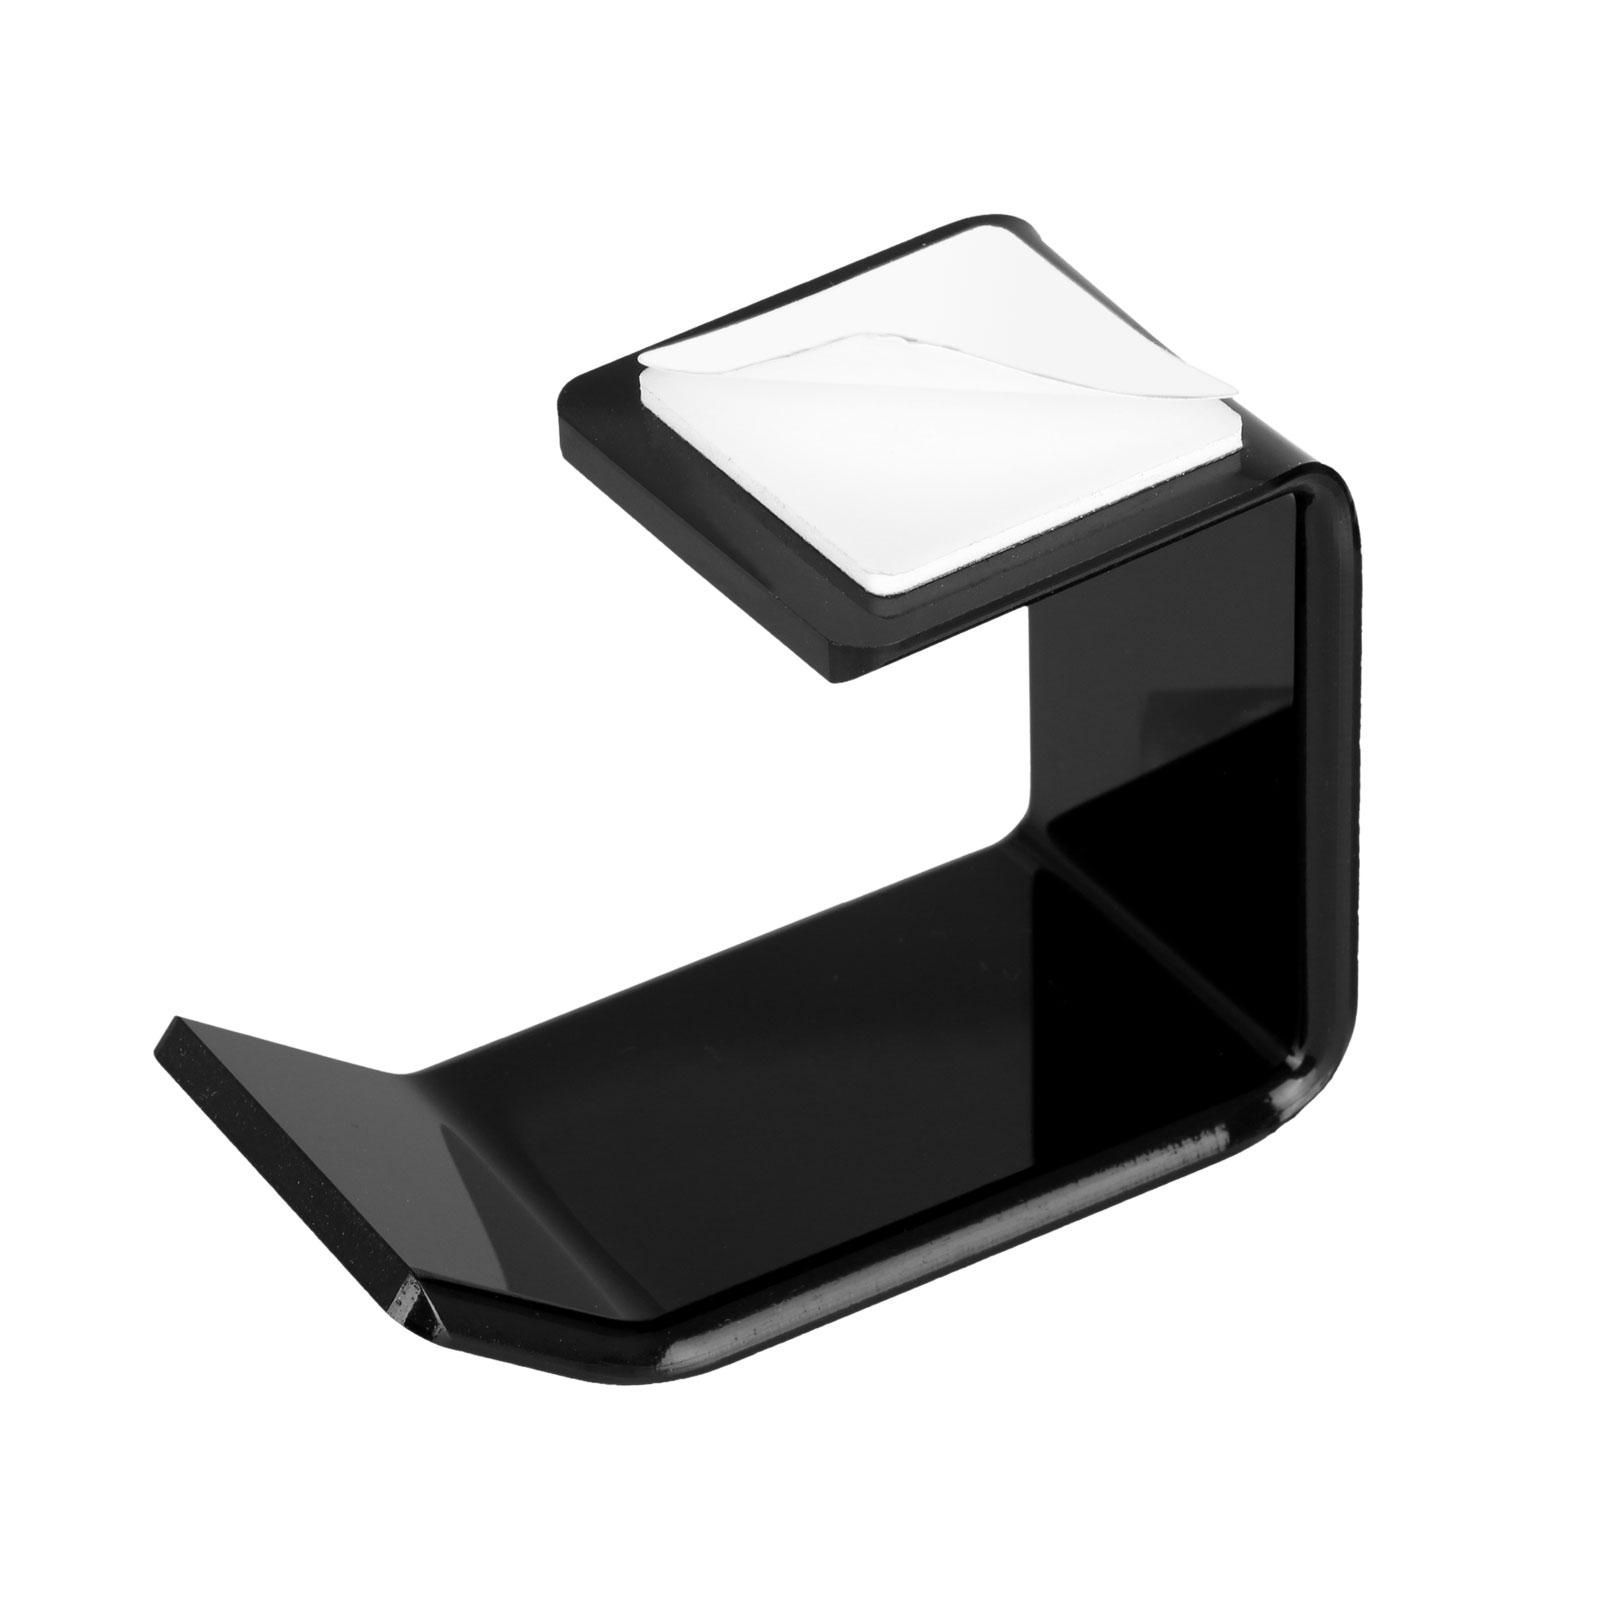 Acrylic Headphone Stand Dual Headset Mount Holder Hanger Hook Tape Under Desk